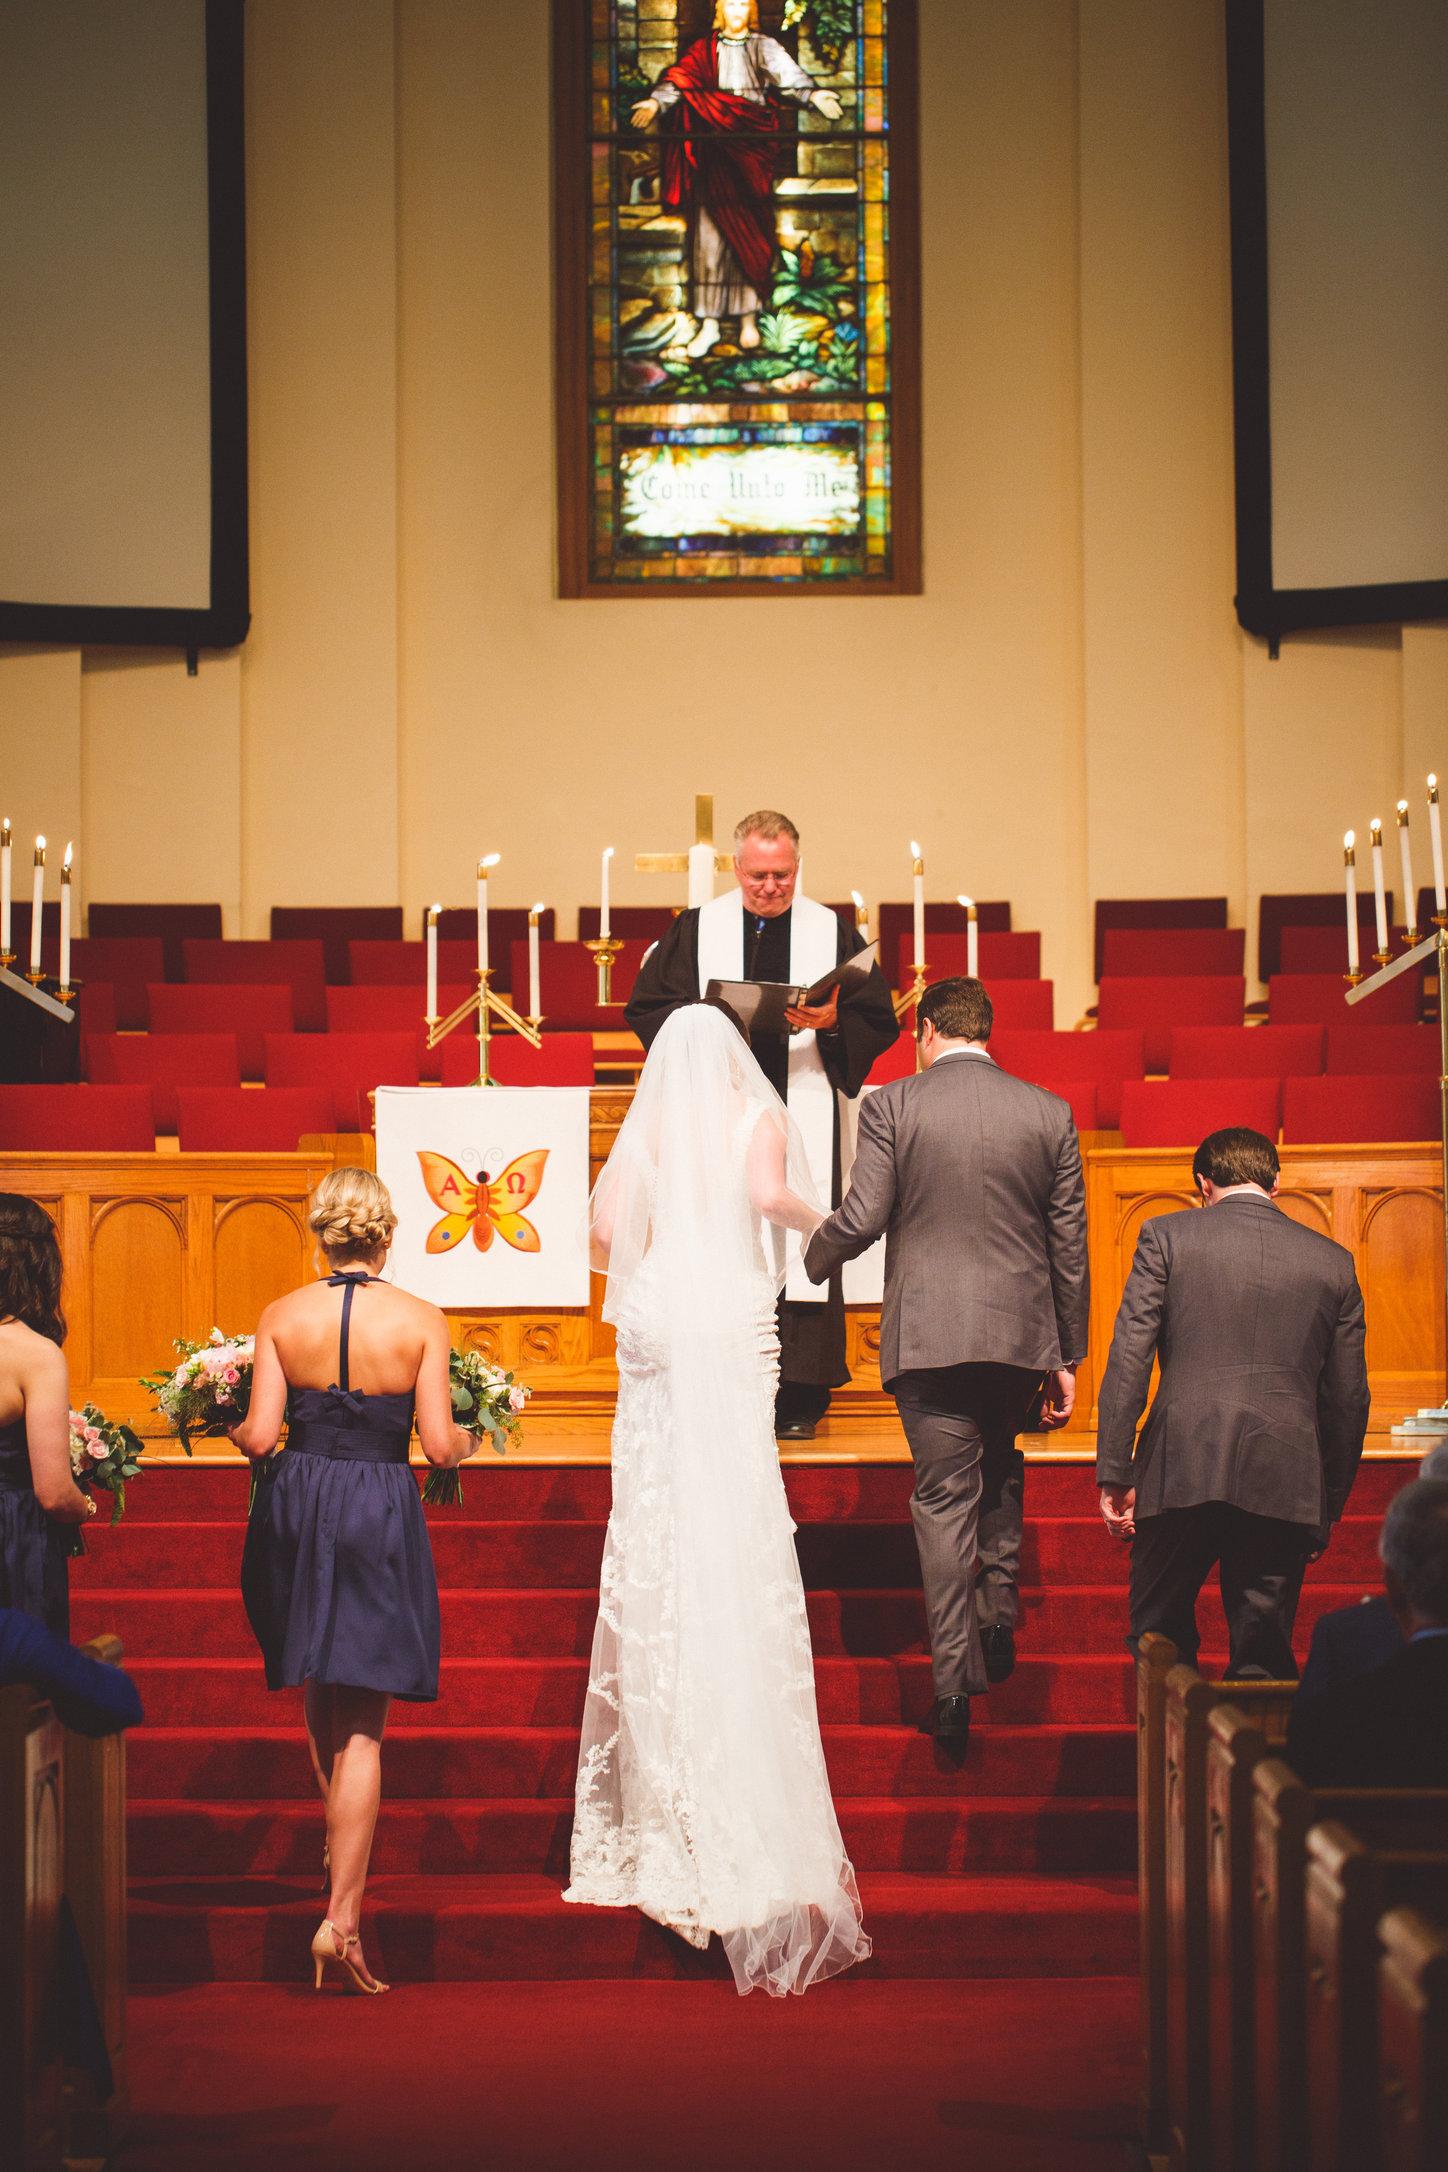 SandC-wedding-177.jpg